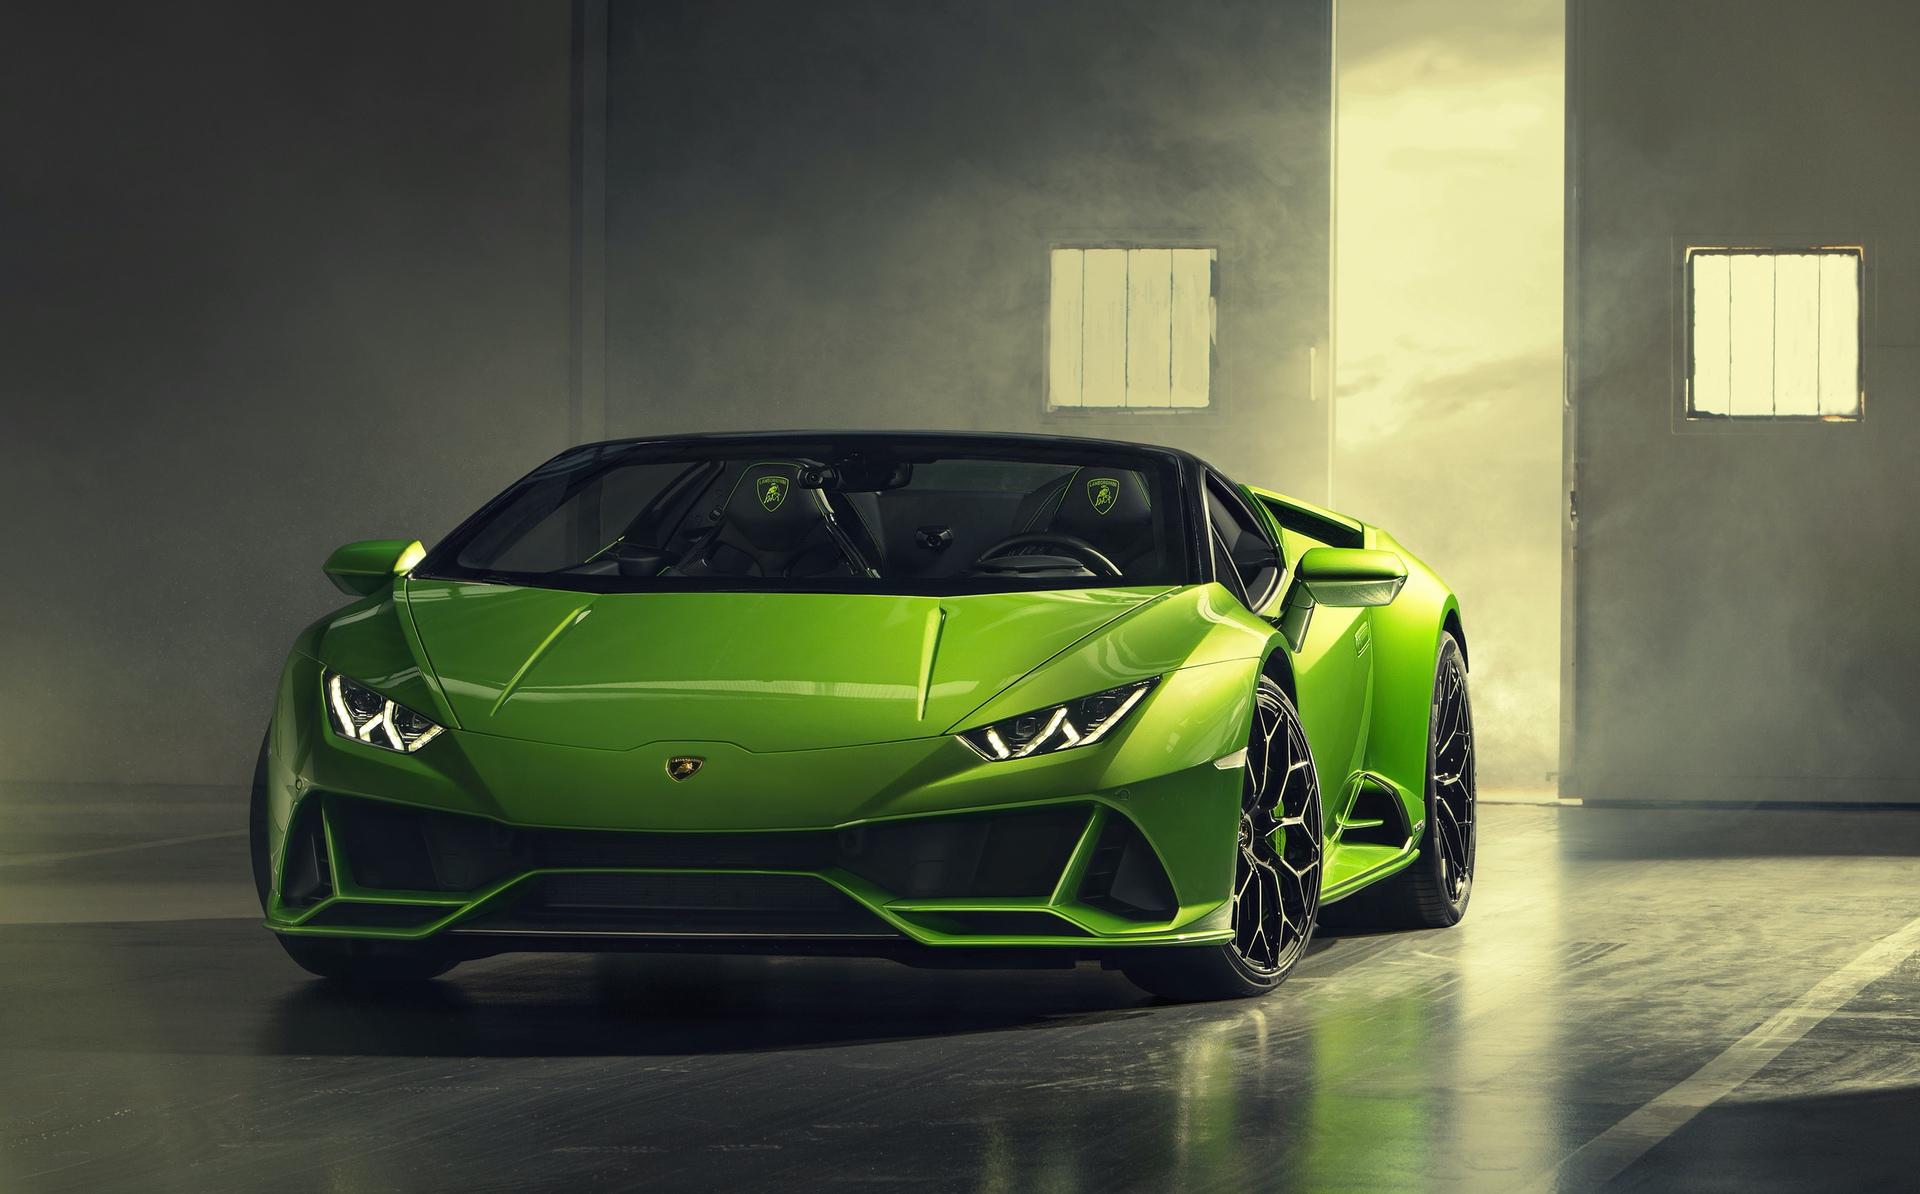 Lamborghini_Huracan_Evo_Spyder_0013